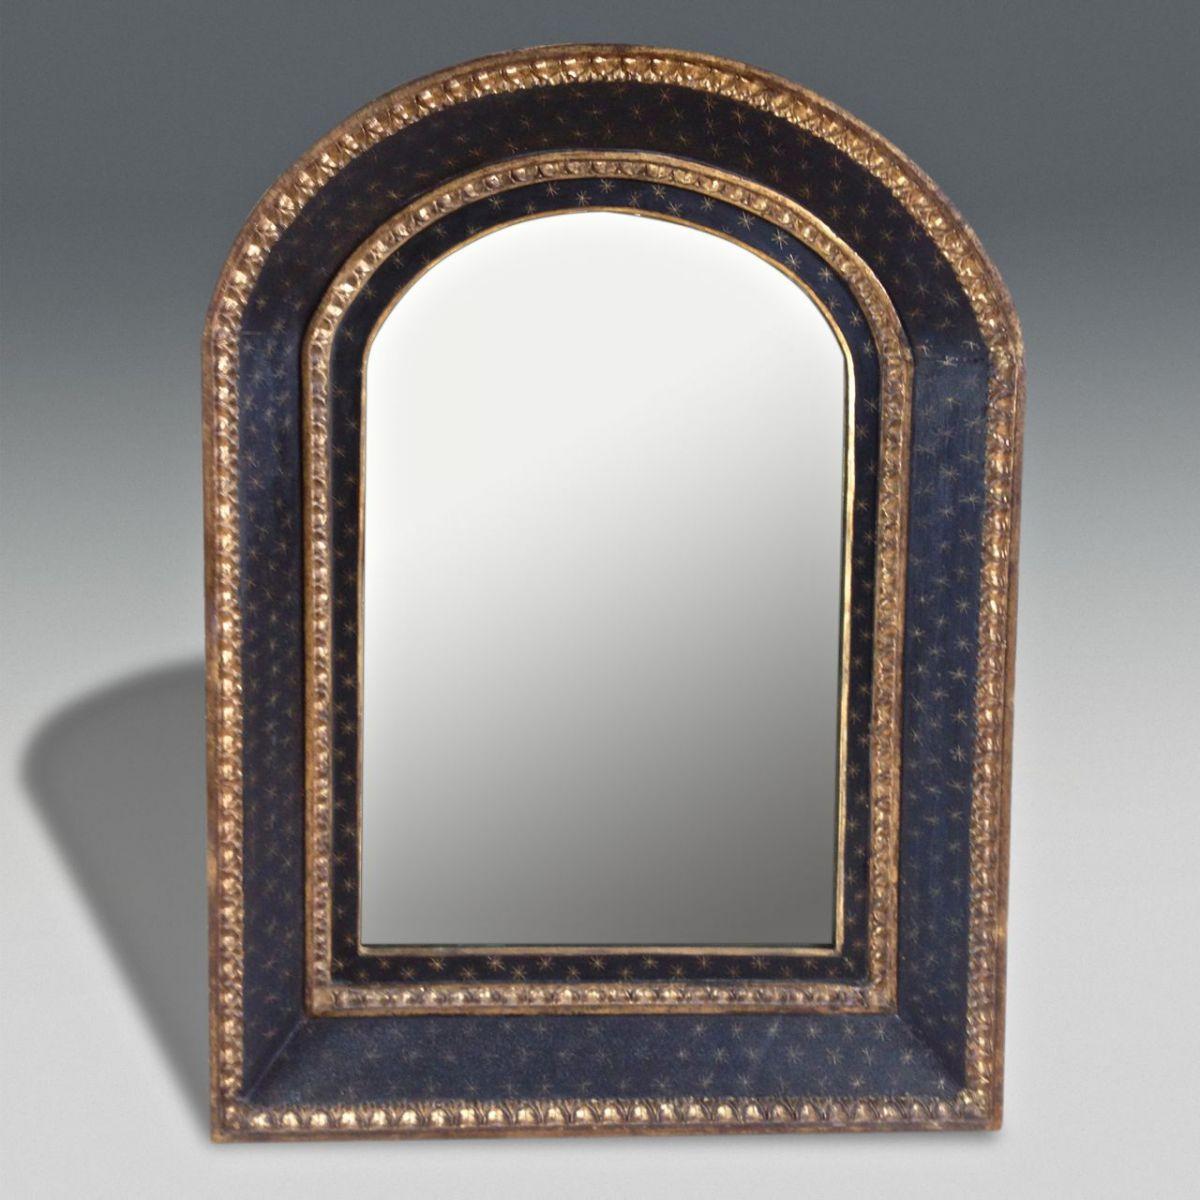 black mirror stock christopher jones antiques london decorative antiques. Black Bedroom Furniture Sets. Home Design Ideas